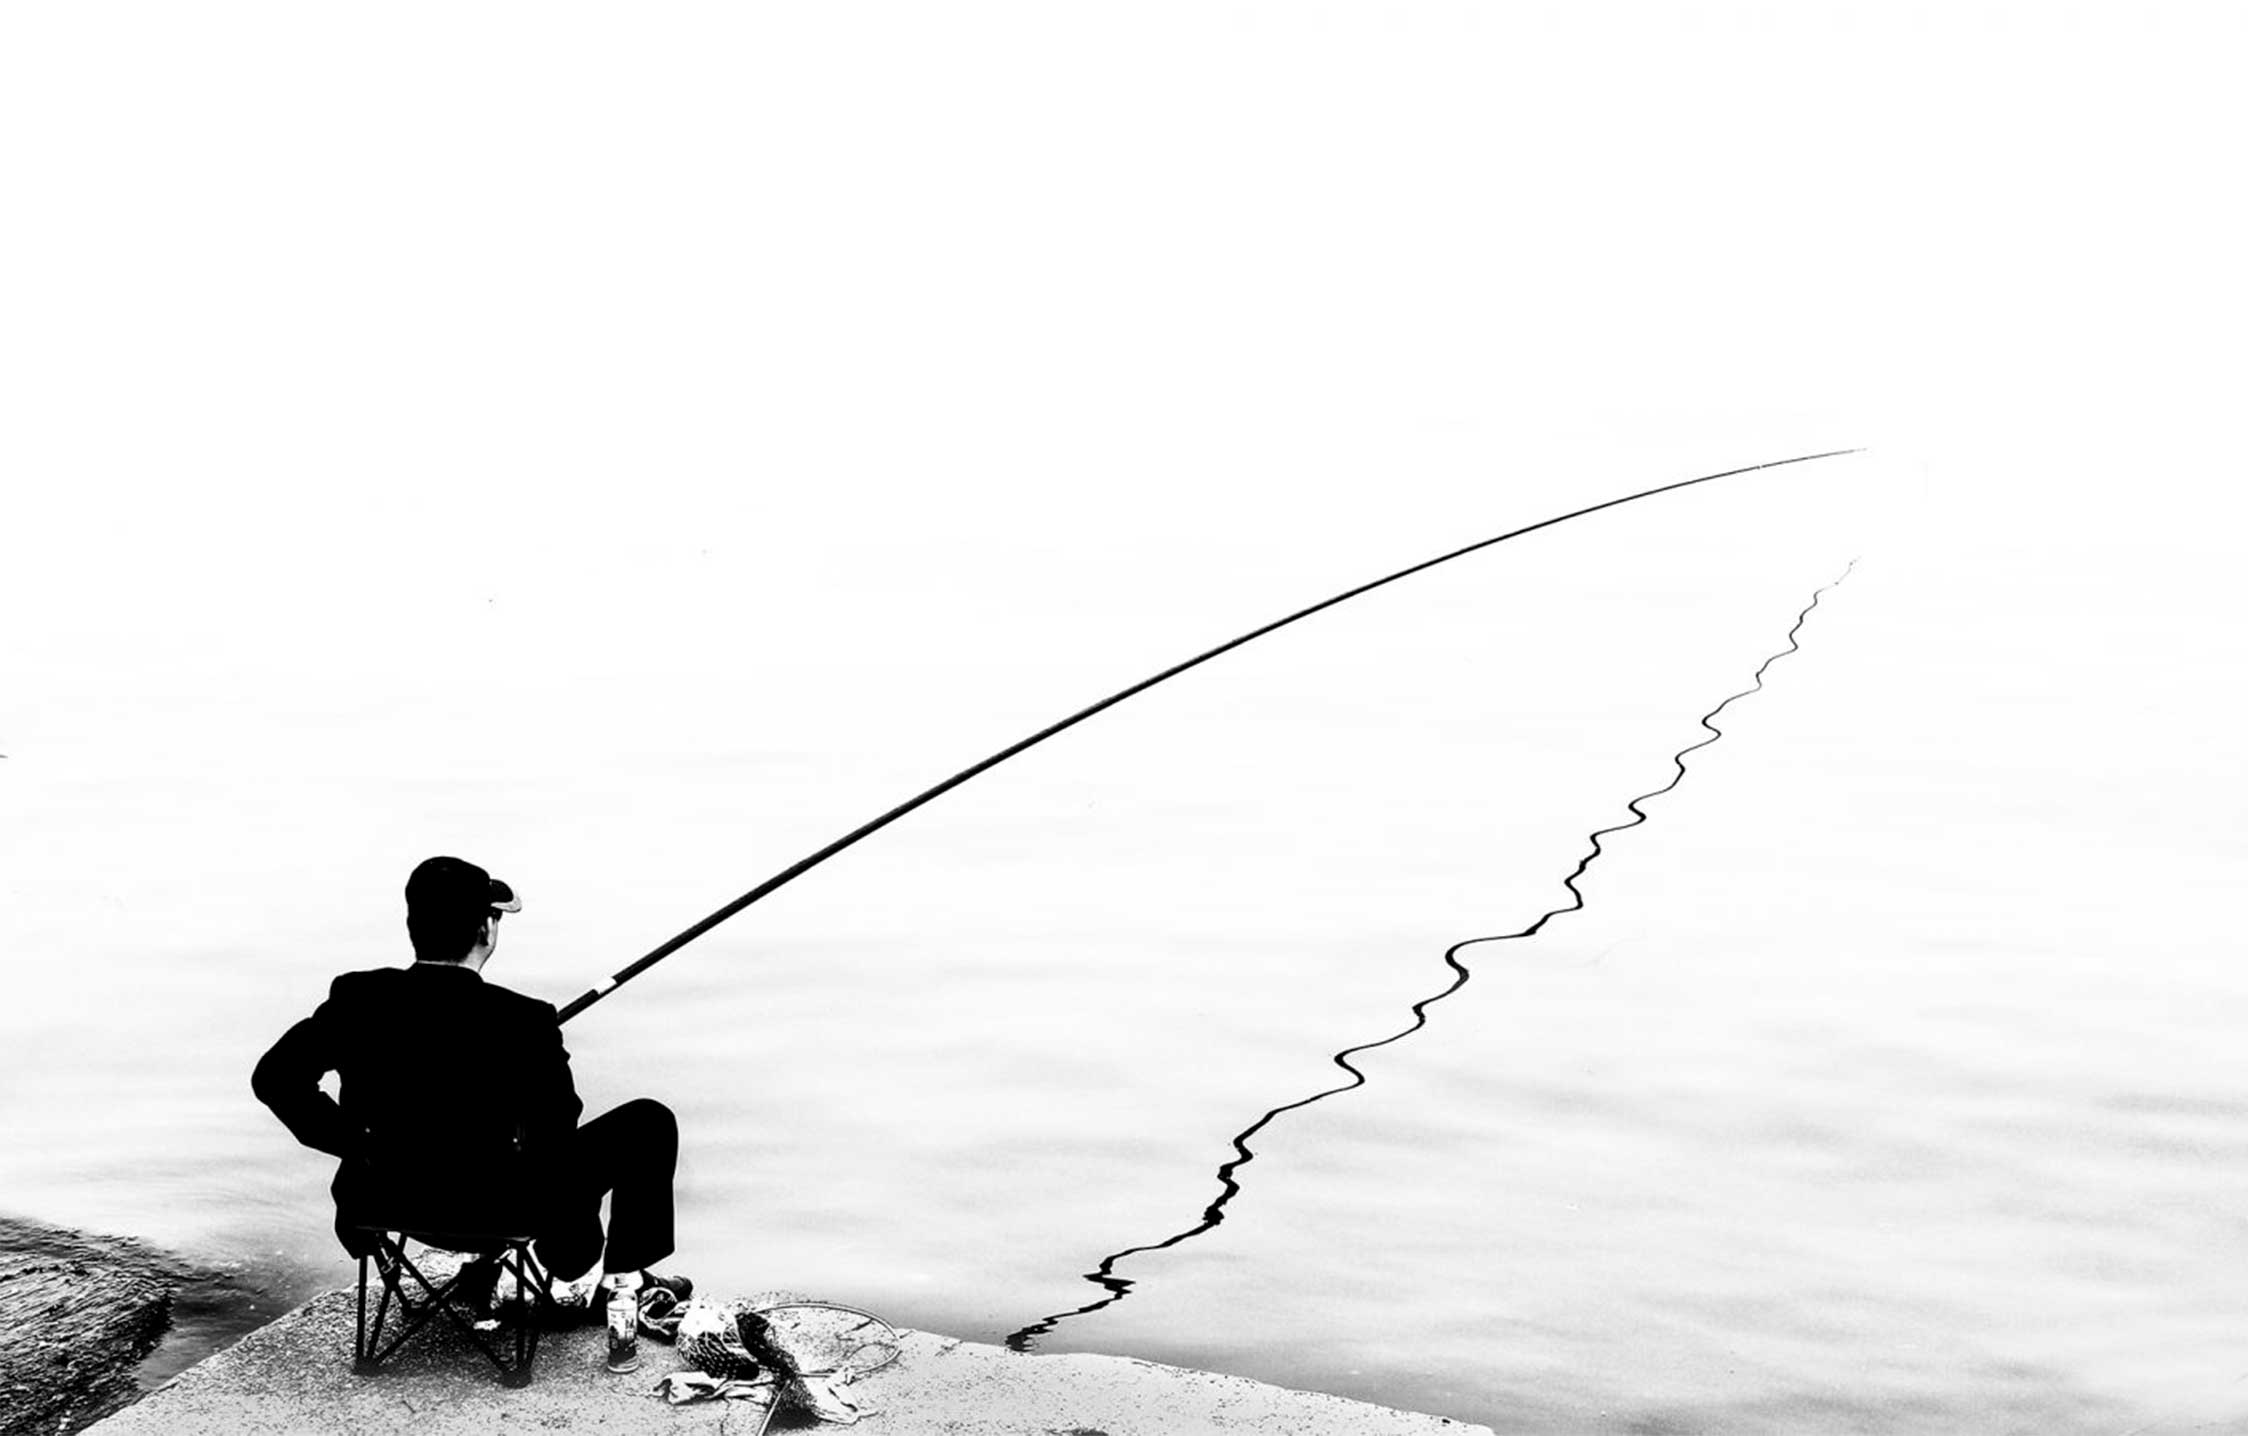 pêche à la ligne - Paul Bonte - 63e